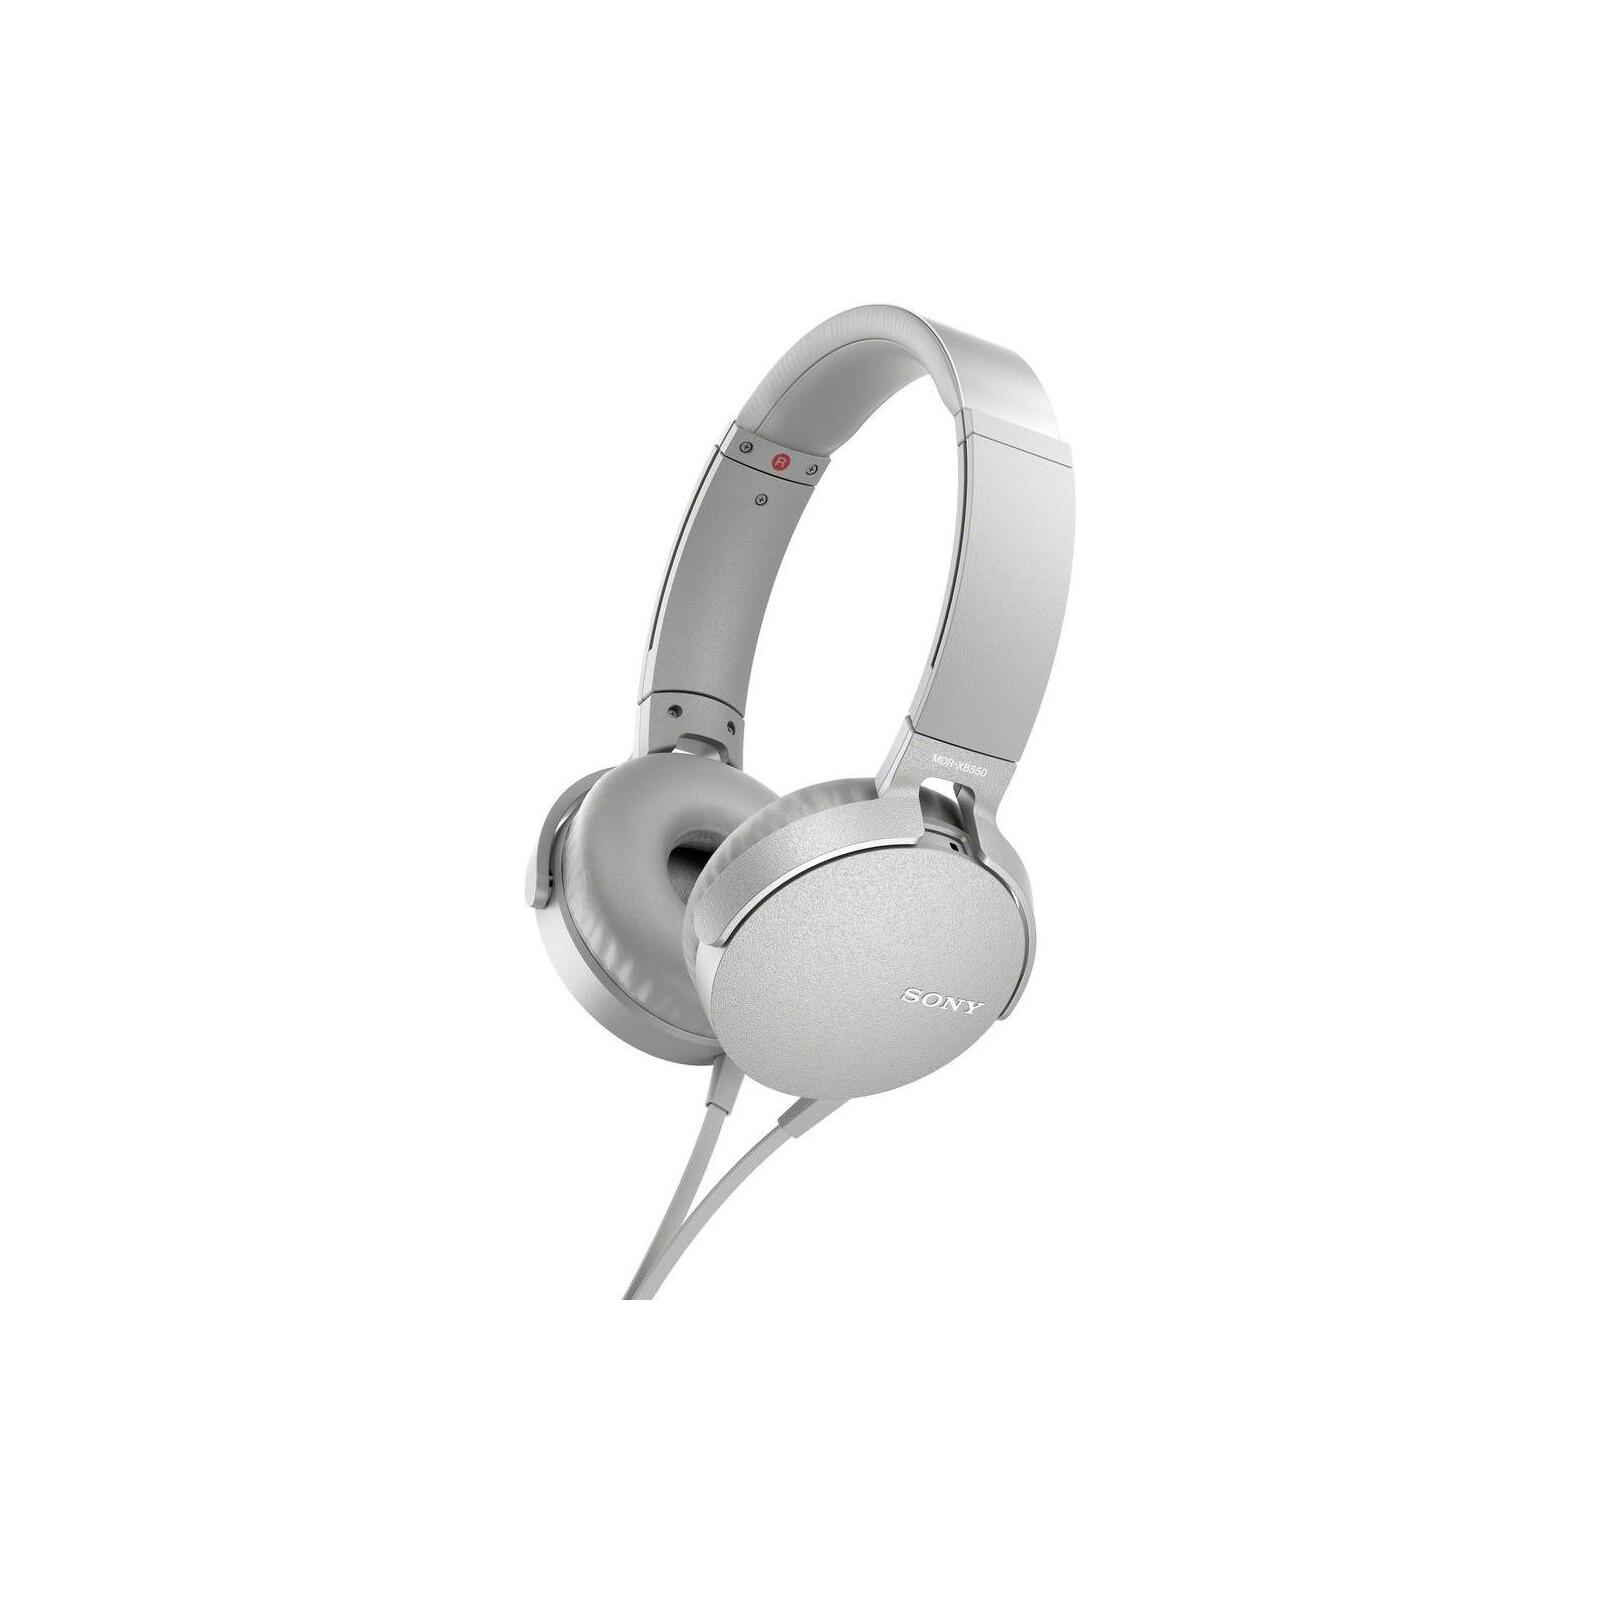 Sony MDR-XB550APW On-Ear